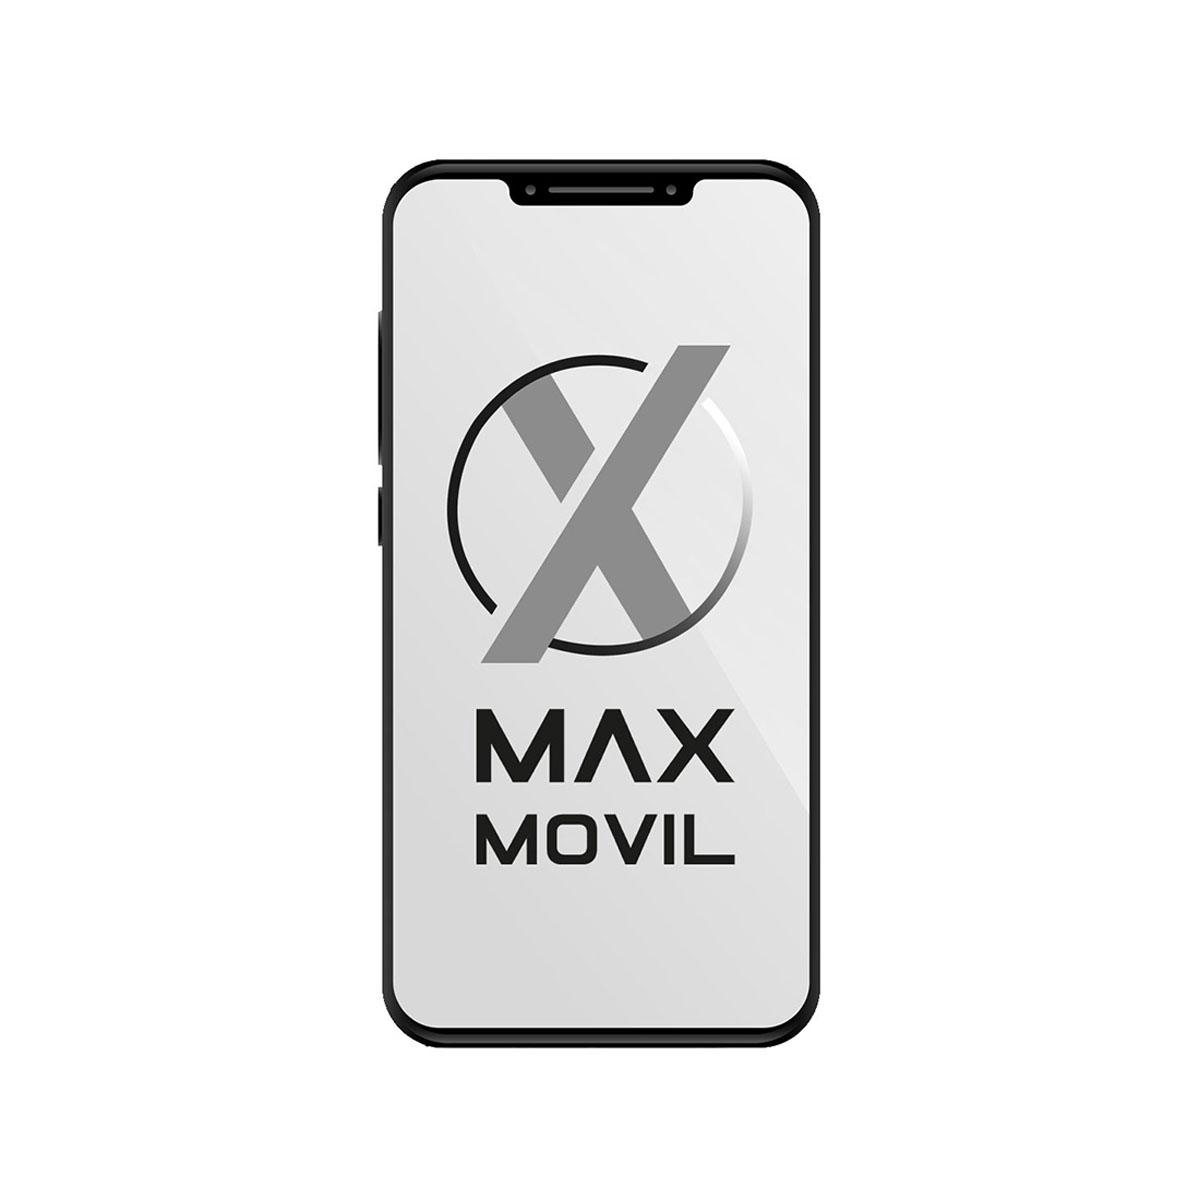 Moviltruito | Motorola Moto G LTE XT1039 8Gb blanco libre DESPRECINTADO